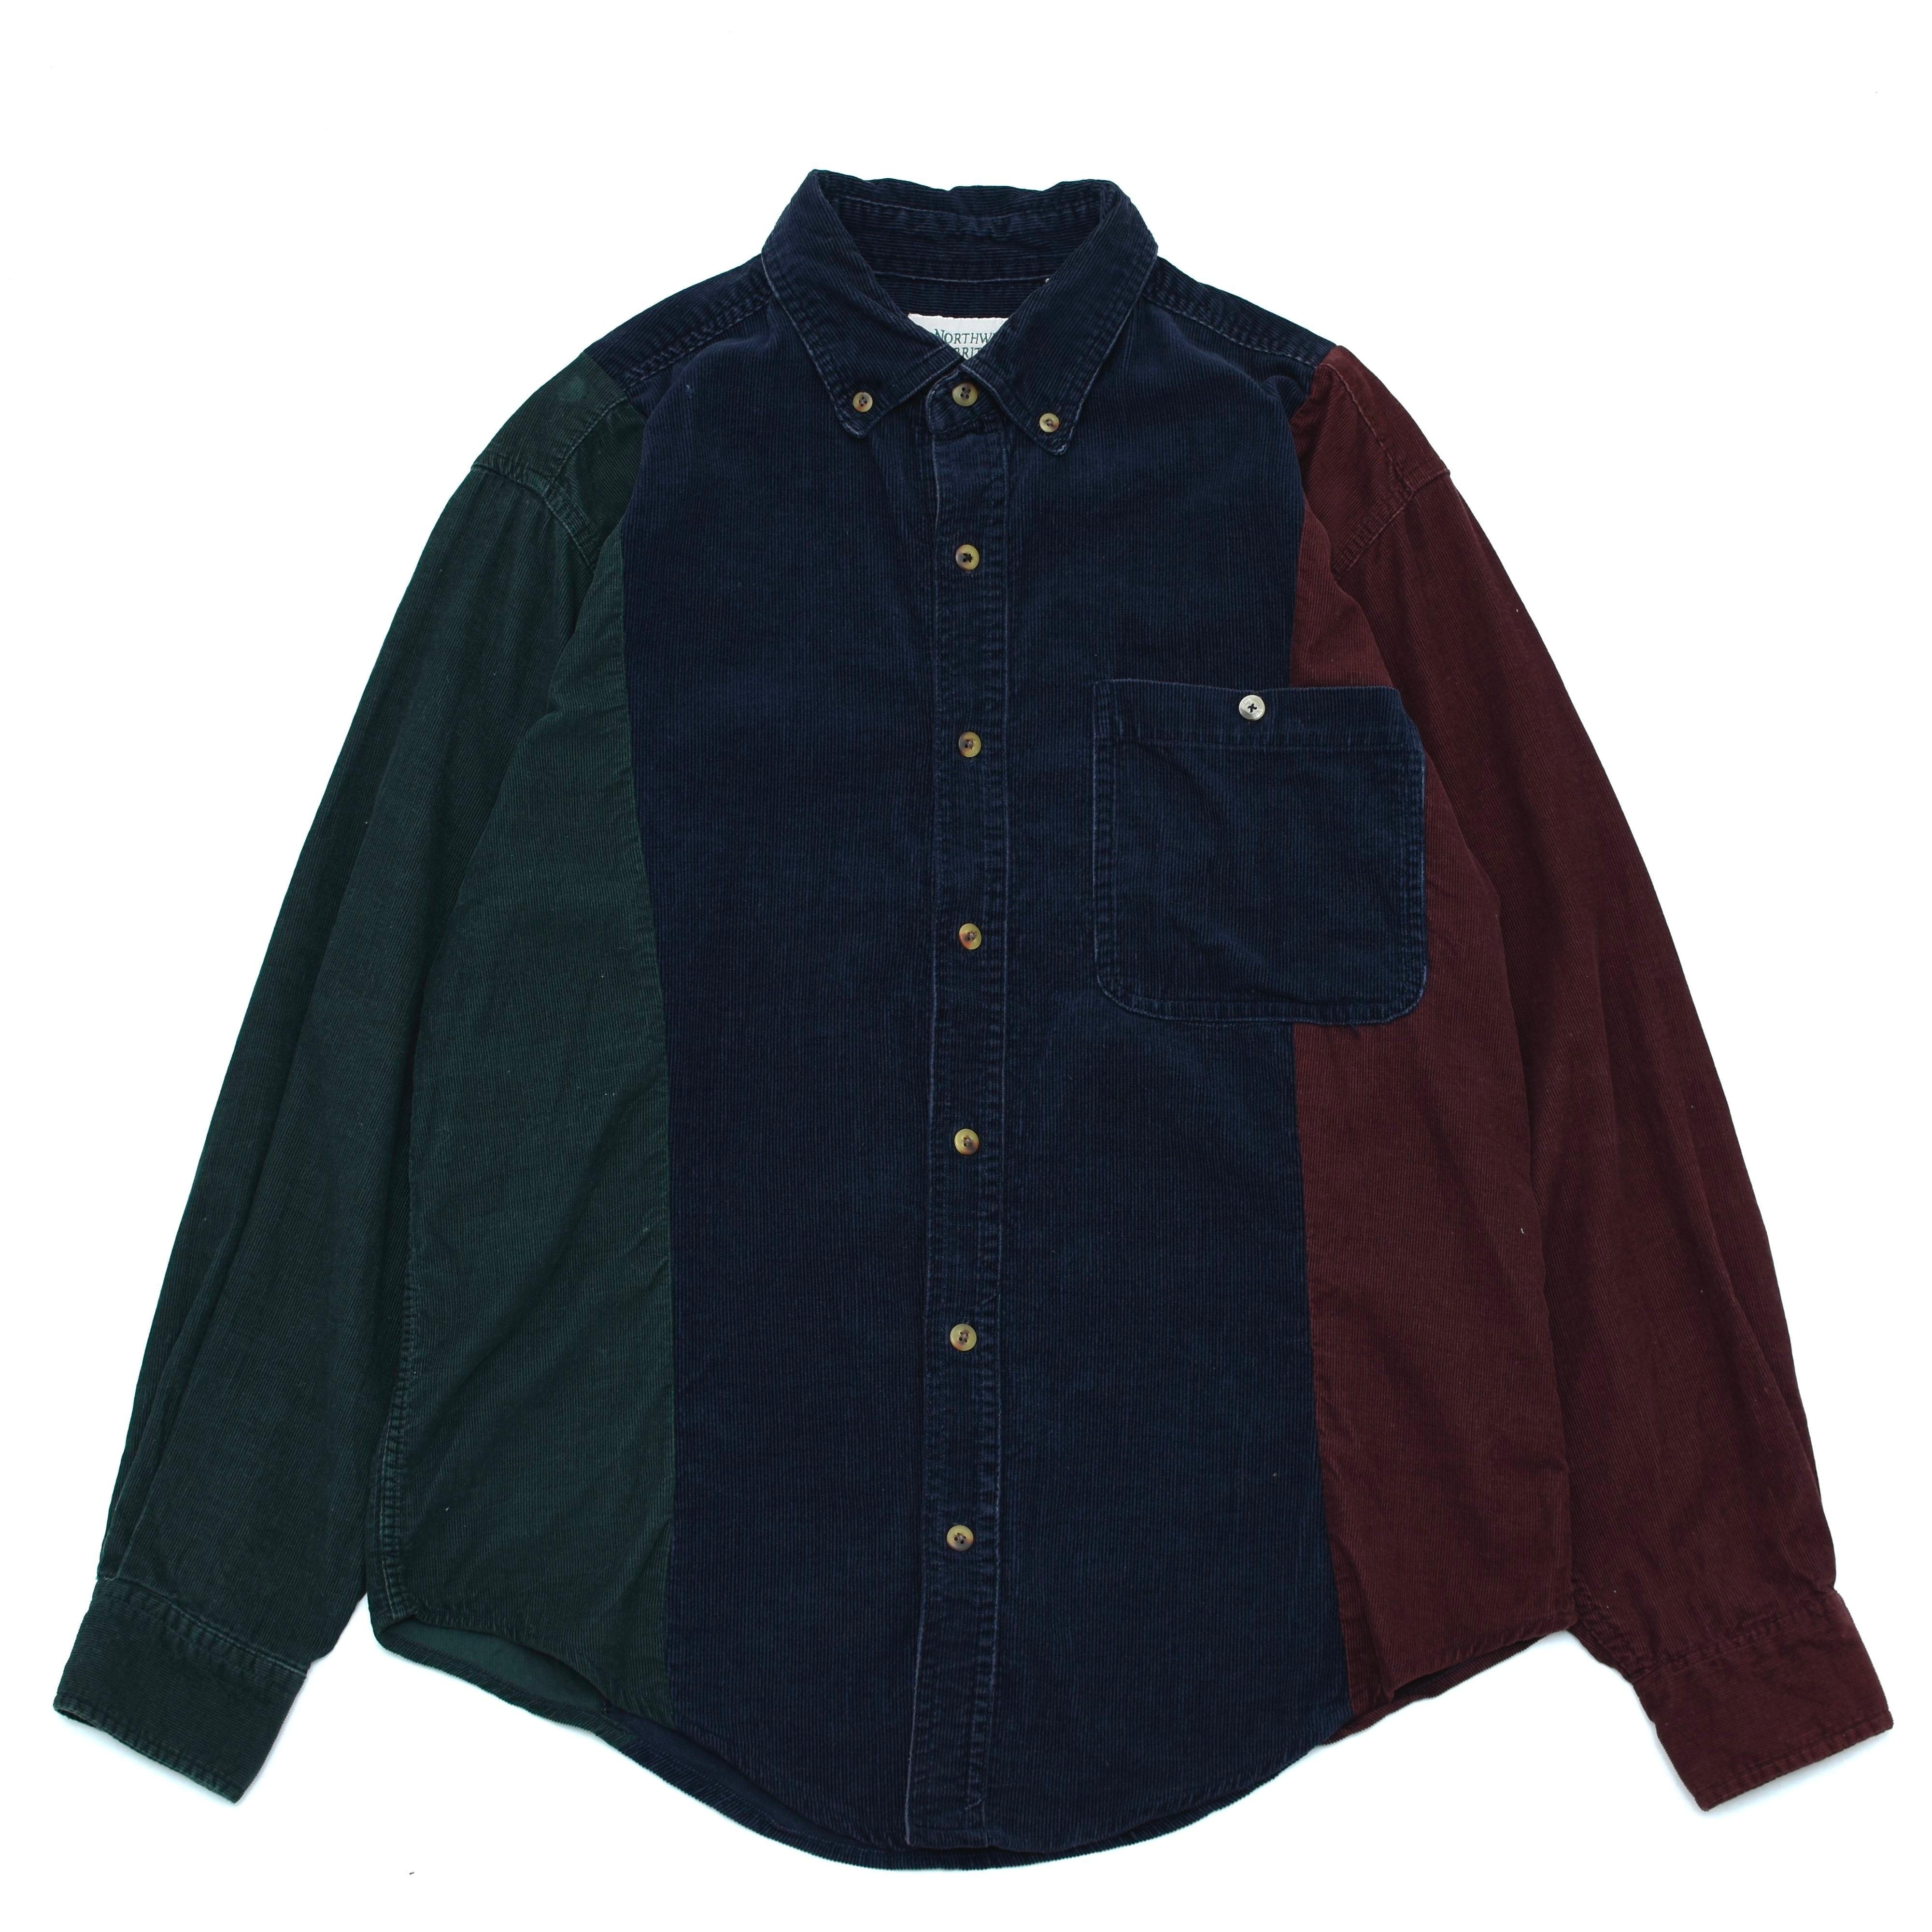 Northwest territoiy crazy corduroy shirt